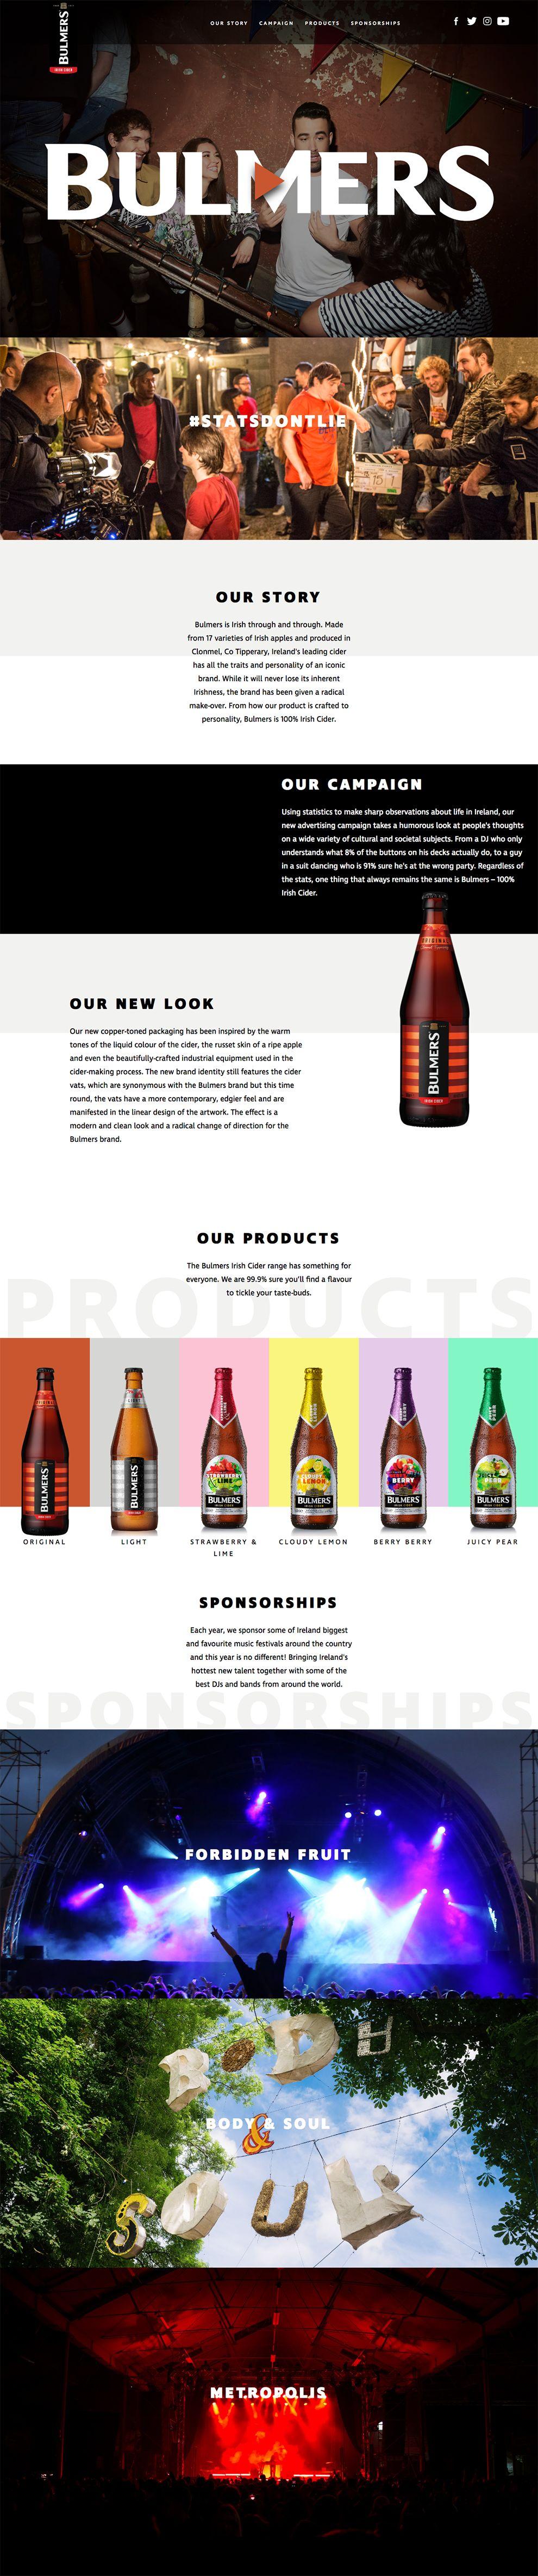 Bulmers Great Website Design